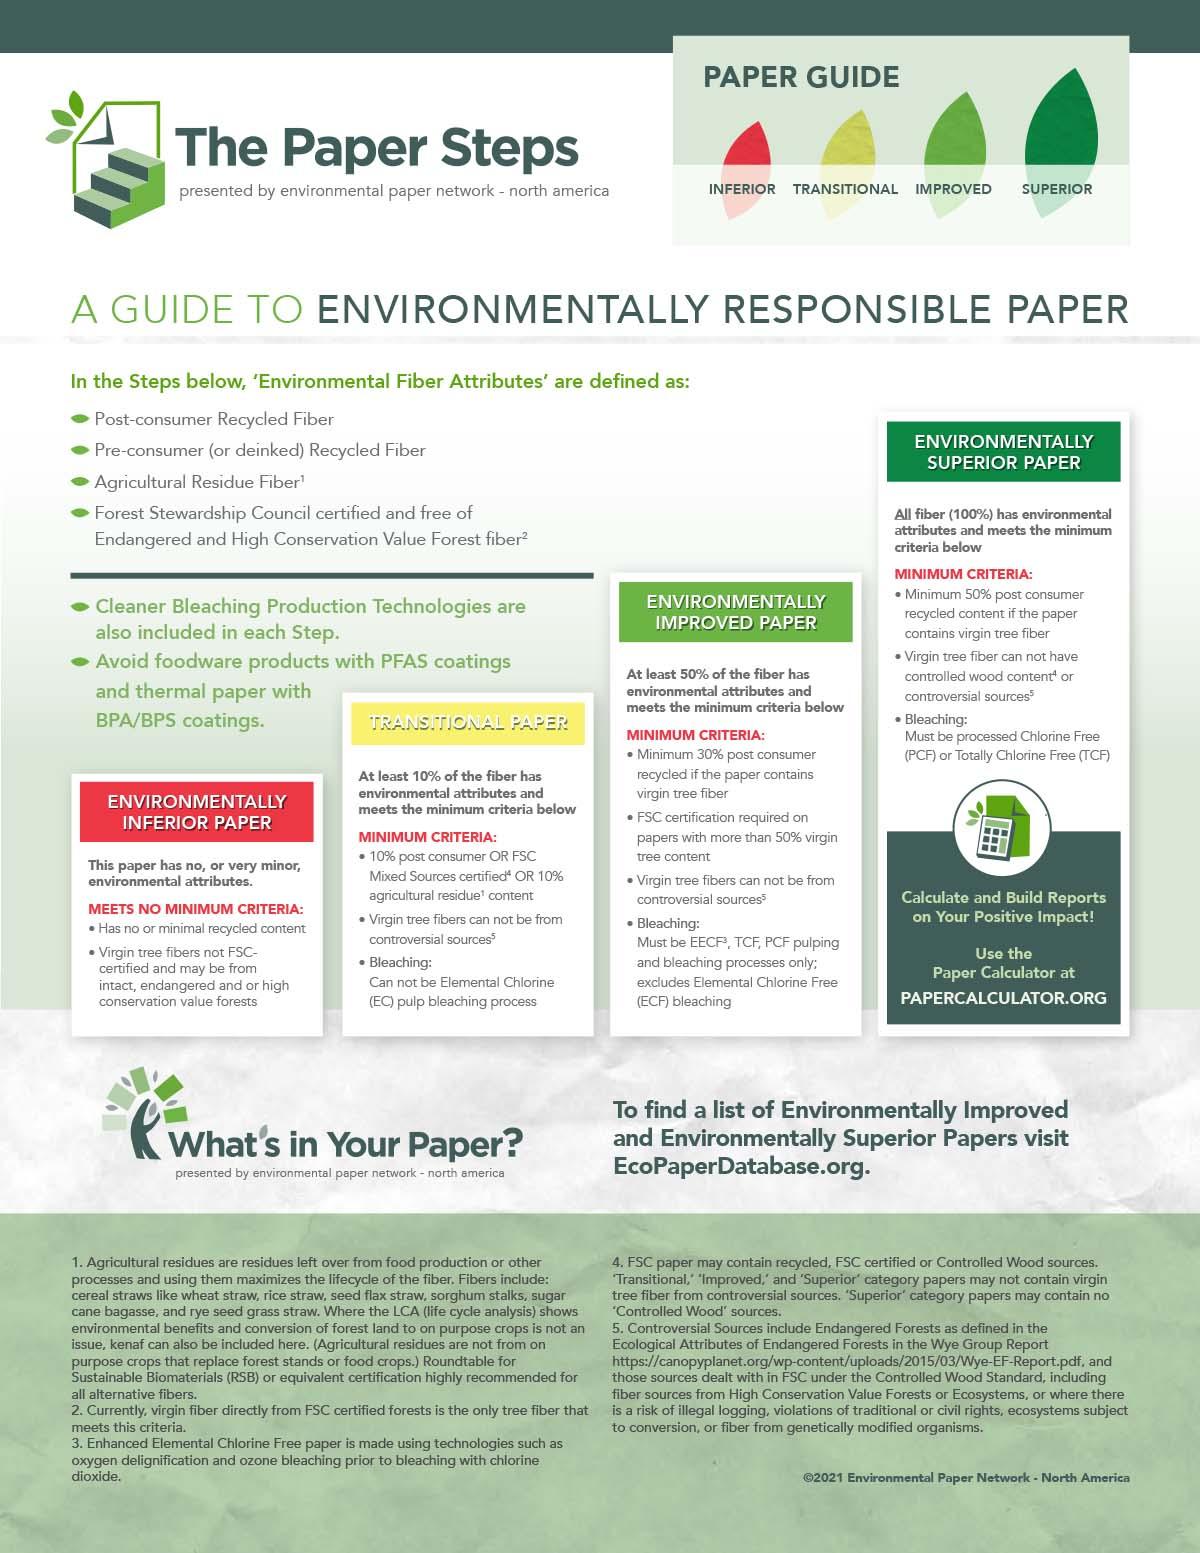 EPN_PaperSteps